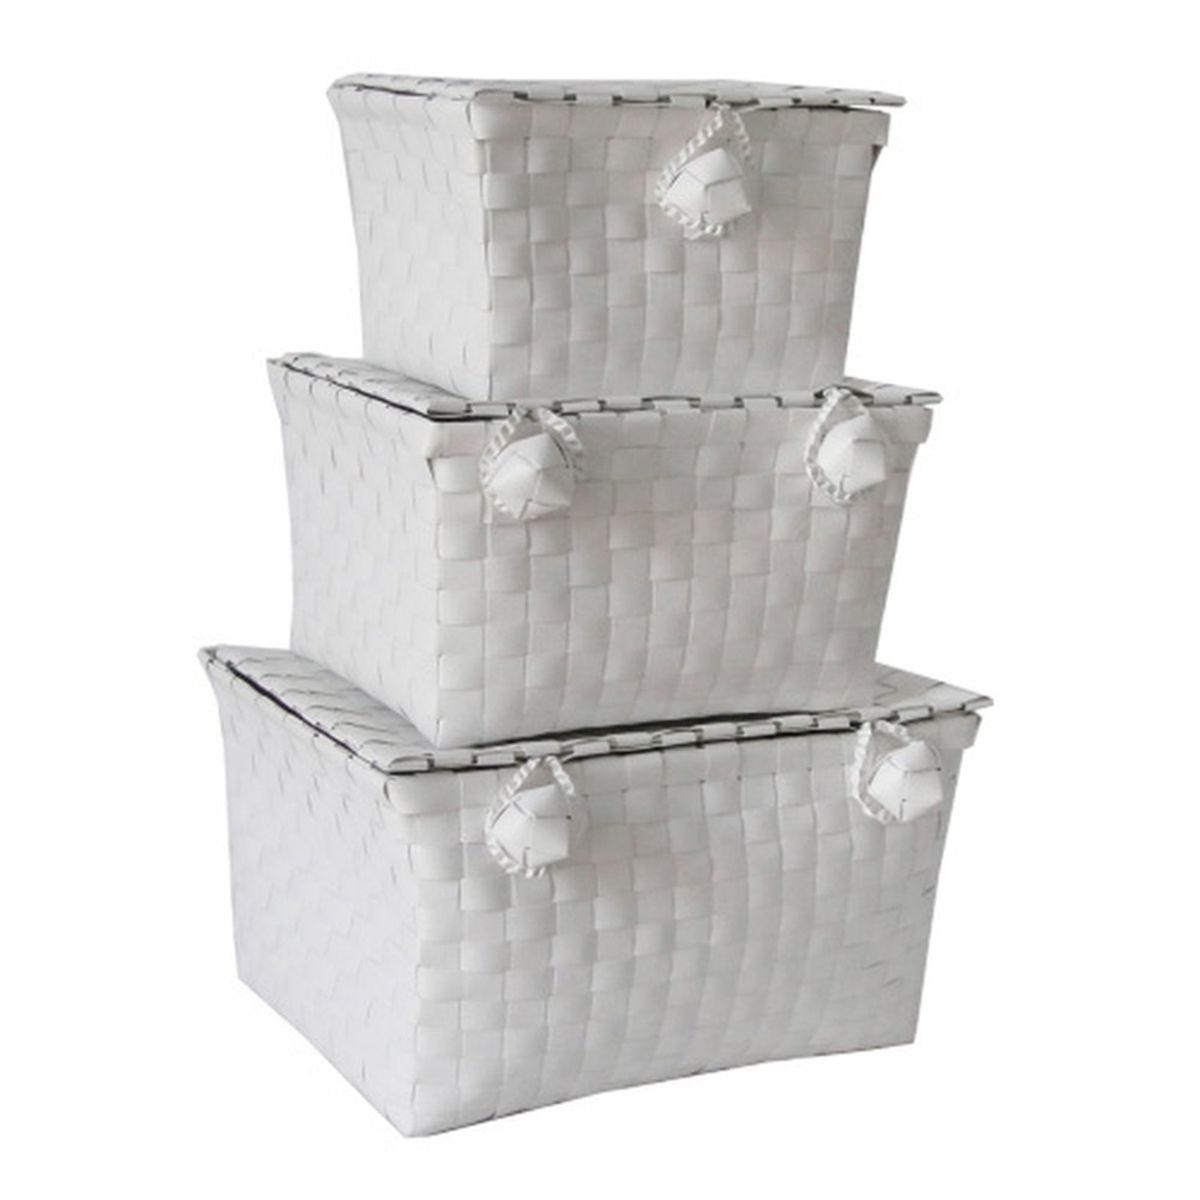 JVL Woven Lidded Storage Units White Set of 3